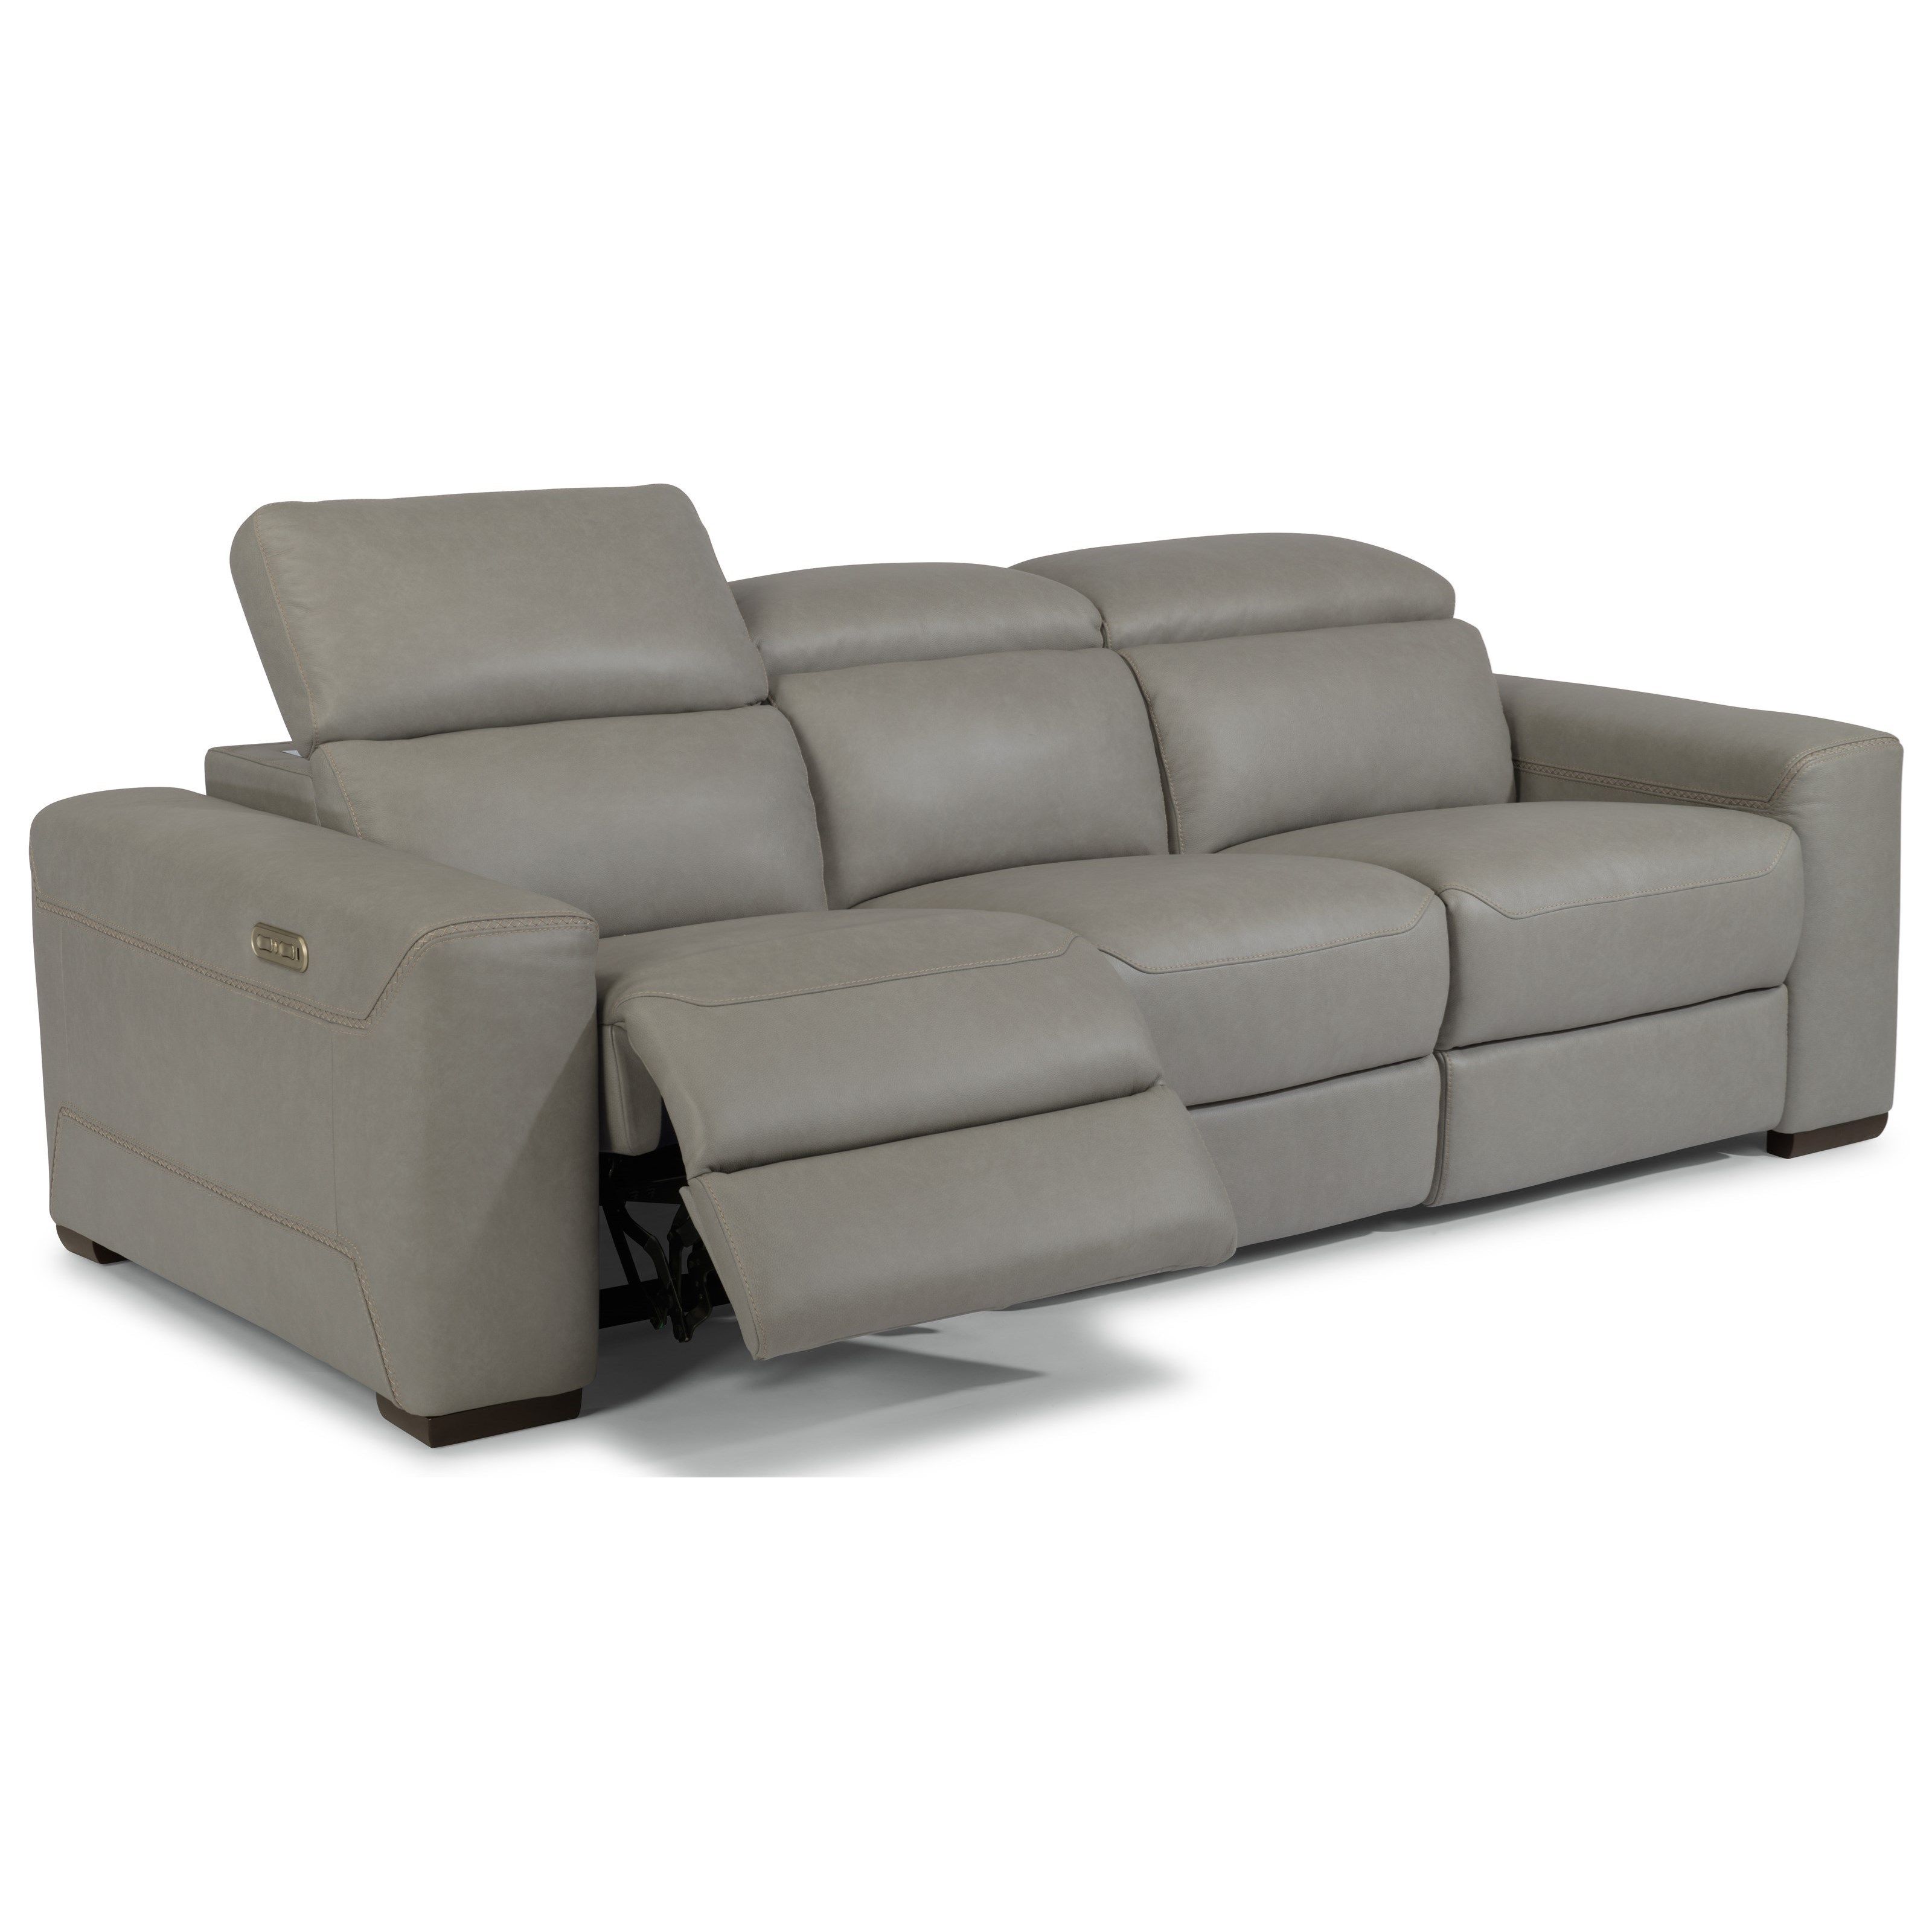 Lexon Sectional Reclining Sofa